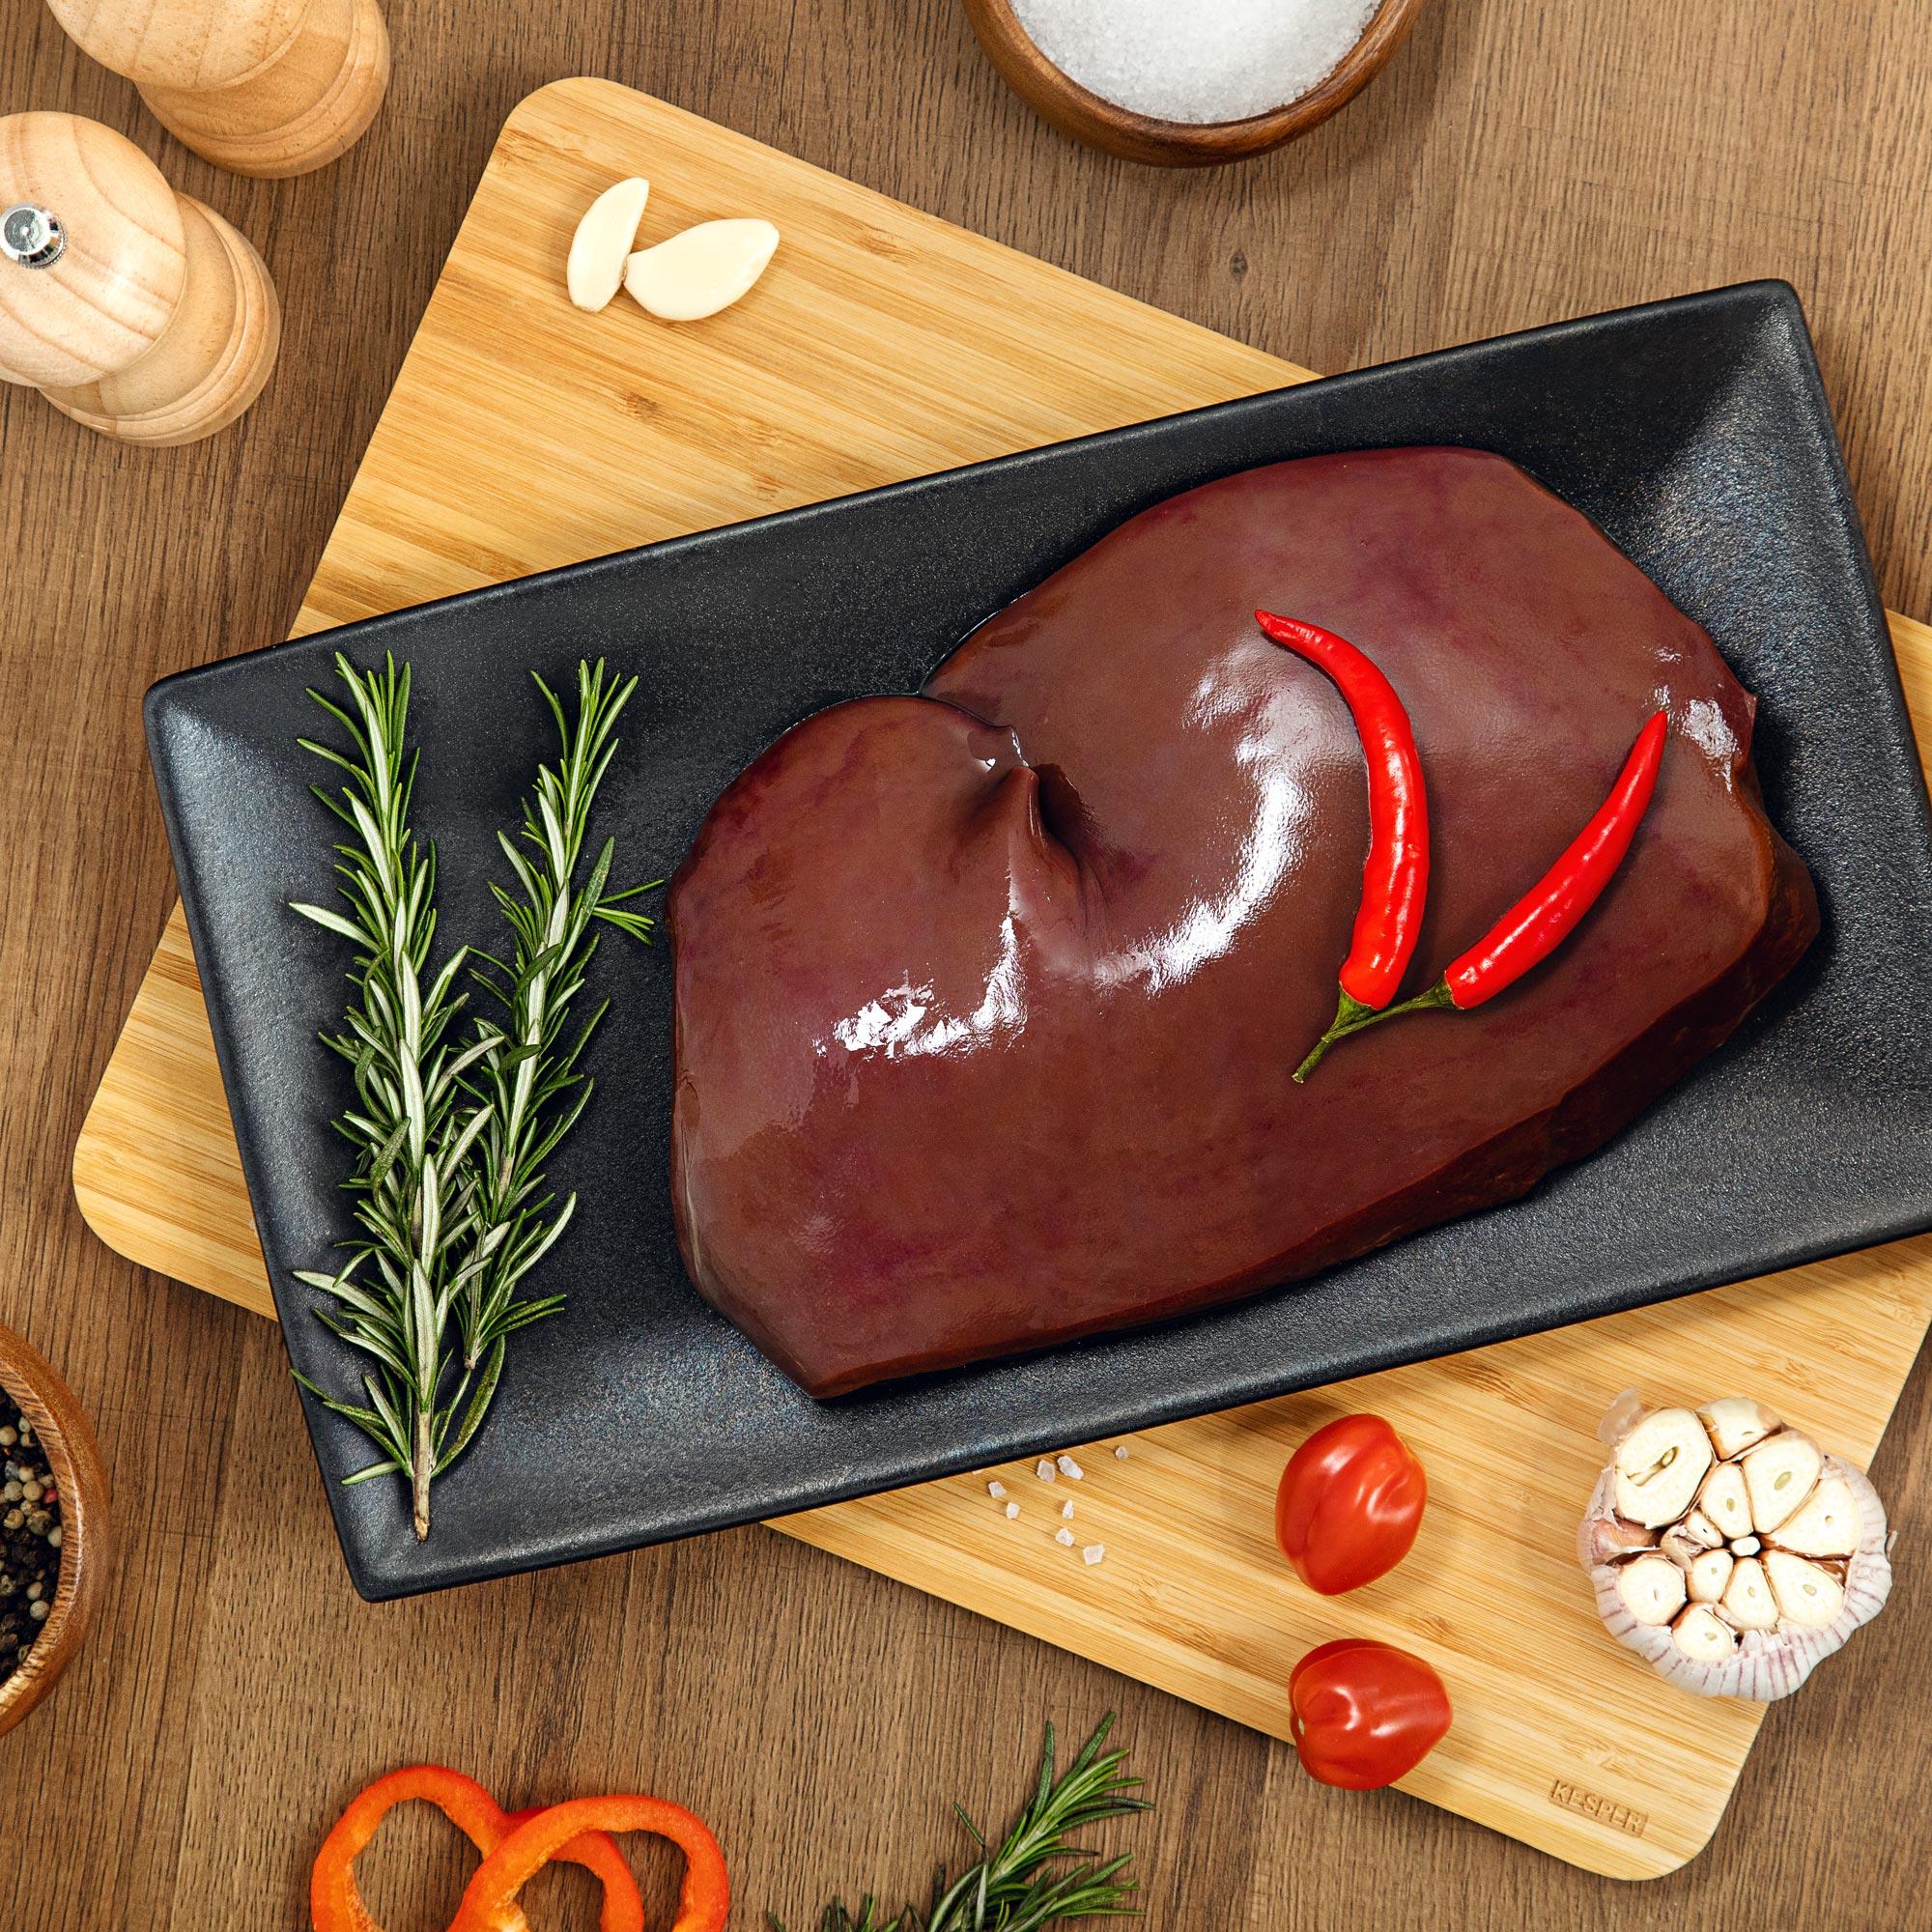 Печень ТД Производство говяжья, кг